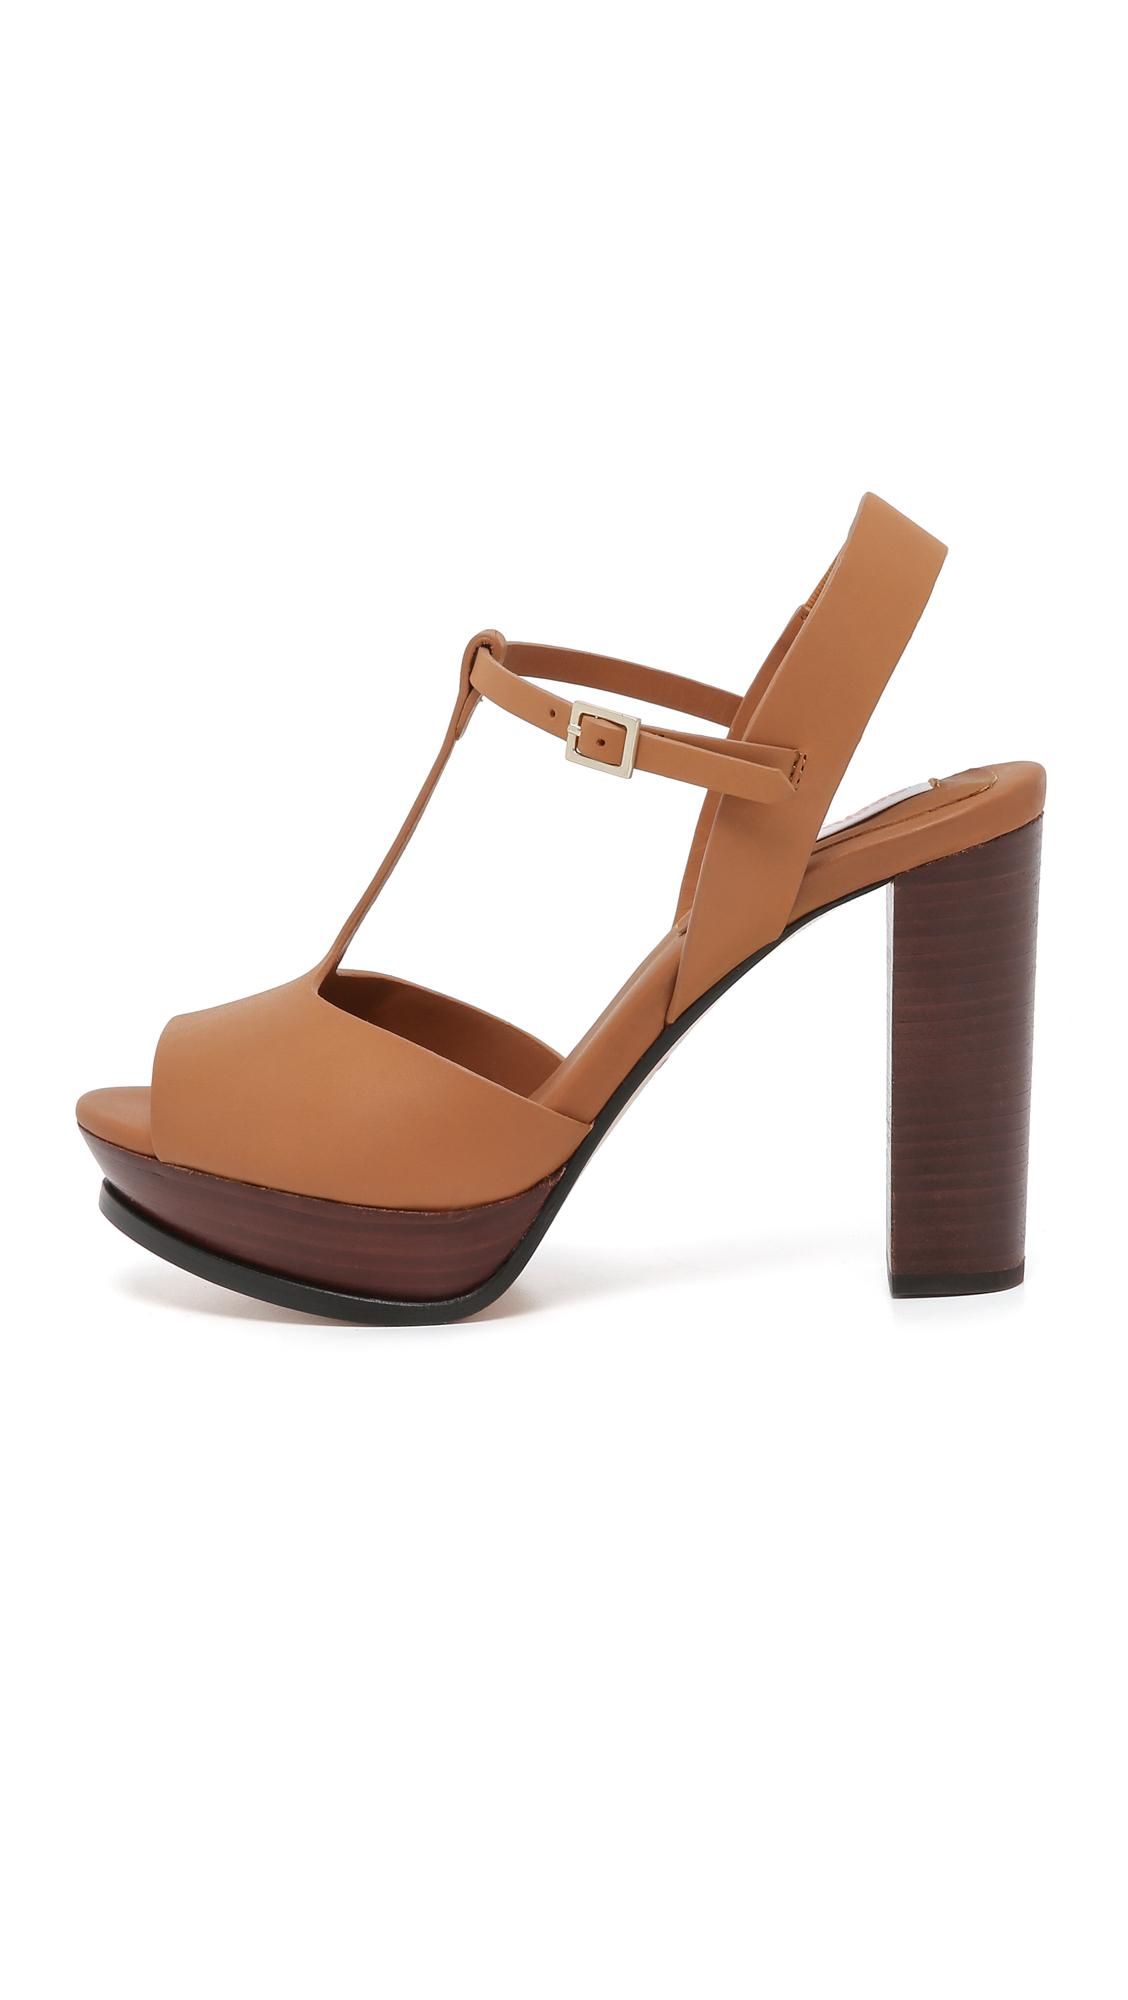 69d6b1c43682 Lyst - See By Chloé Alex Platform Sandals in Brown